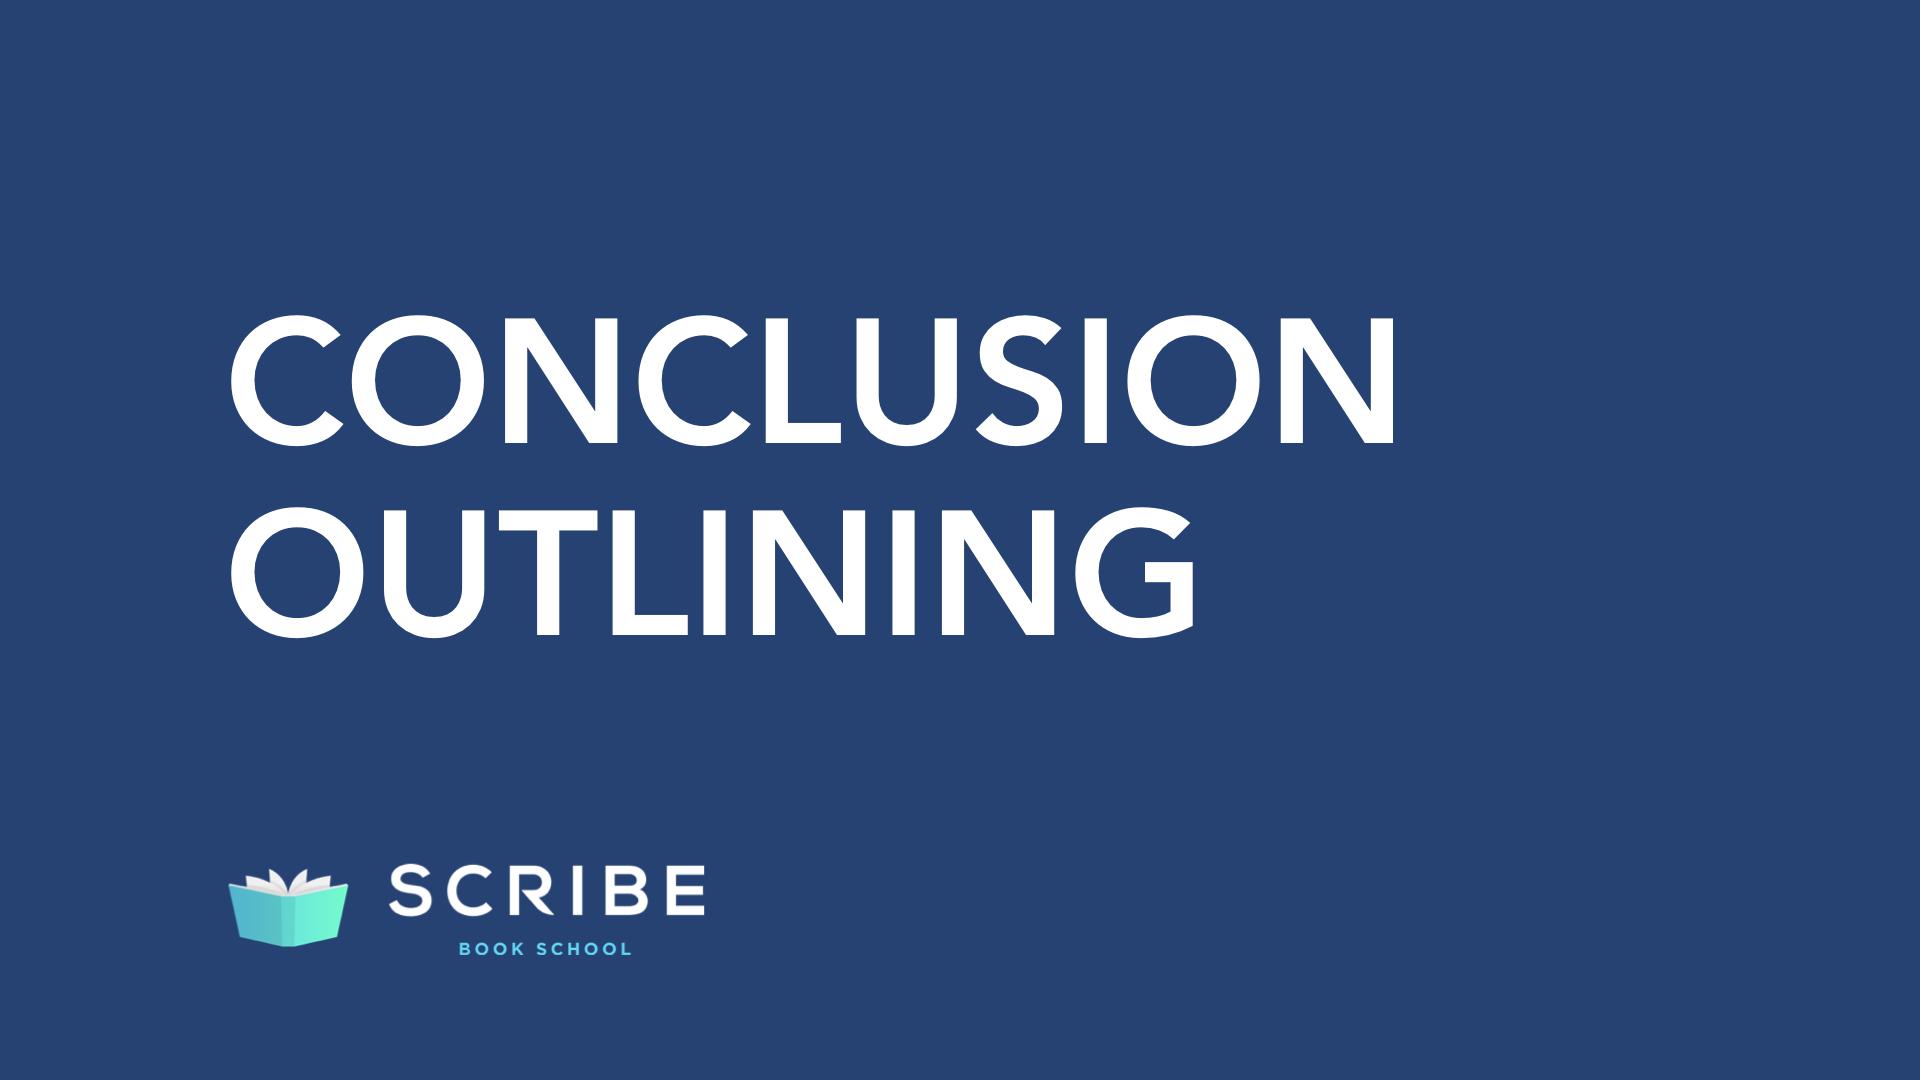 scribe book school conclusion outline